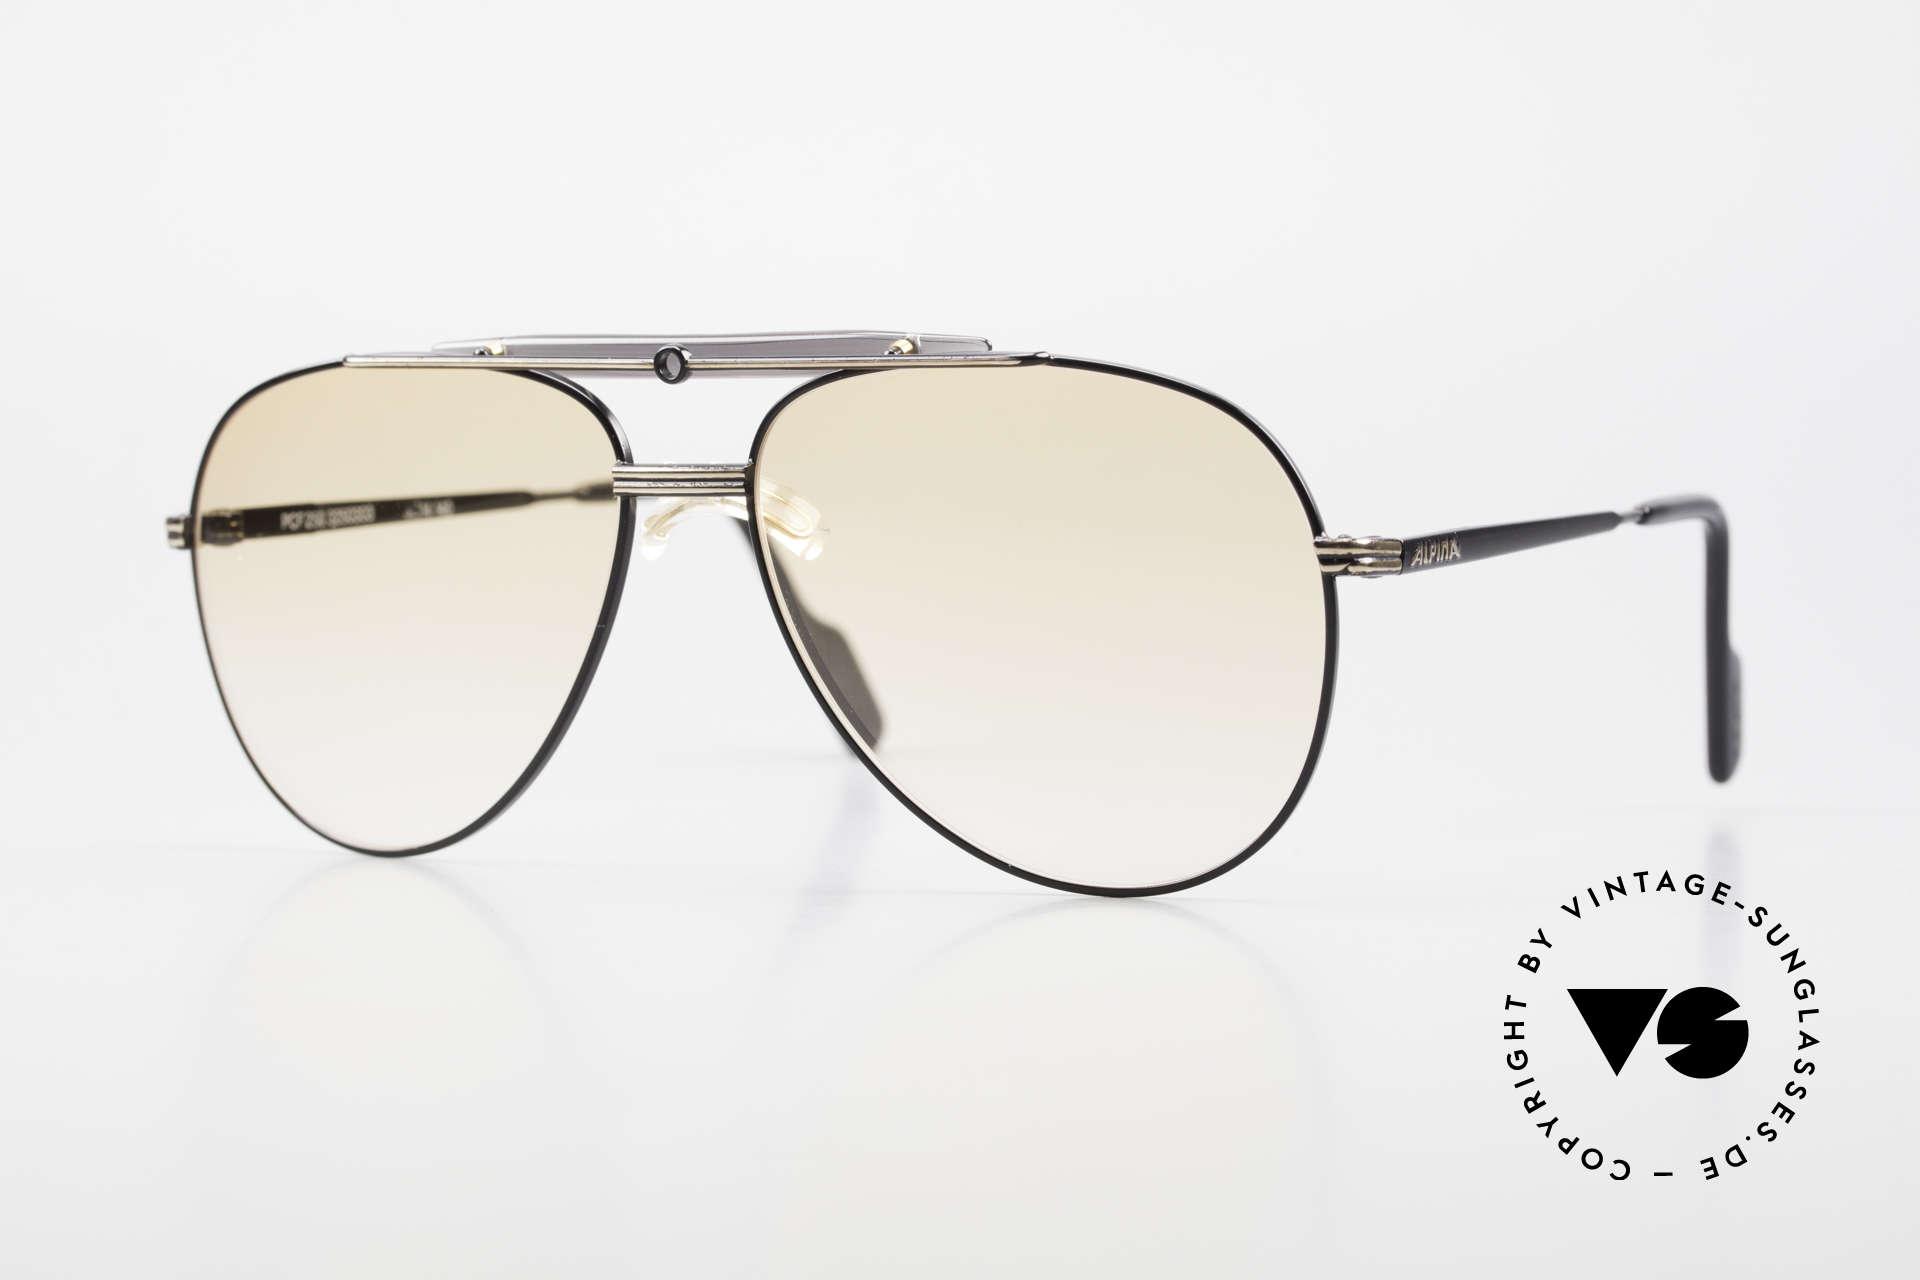 Alpina PCF 250 Sporty 90's Aviator Sunglasses, Alpina sunglasses of the legendary Procar Series, Made for Men